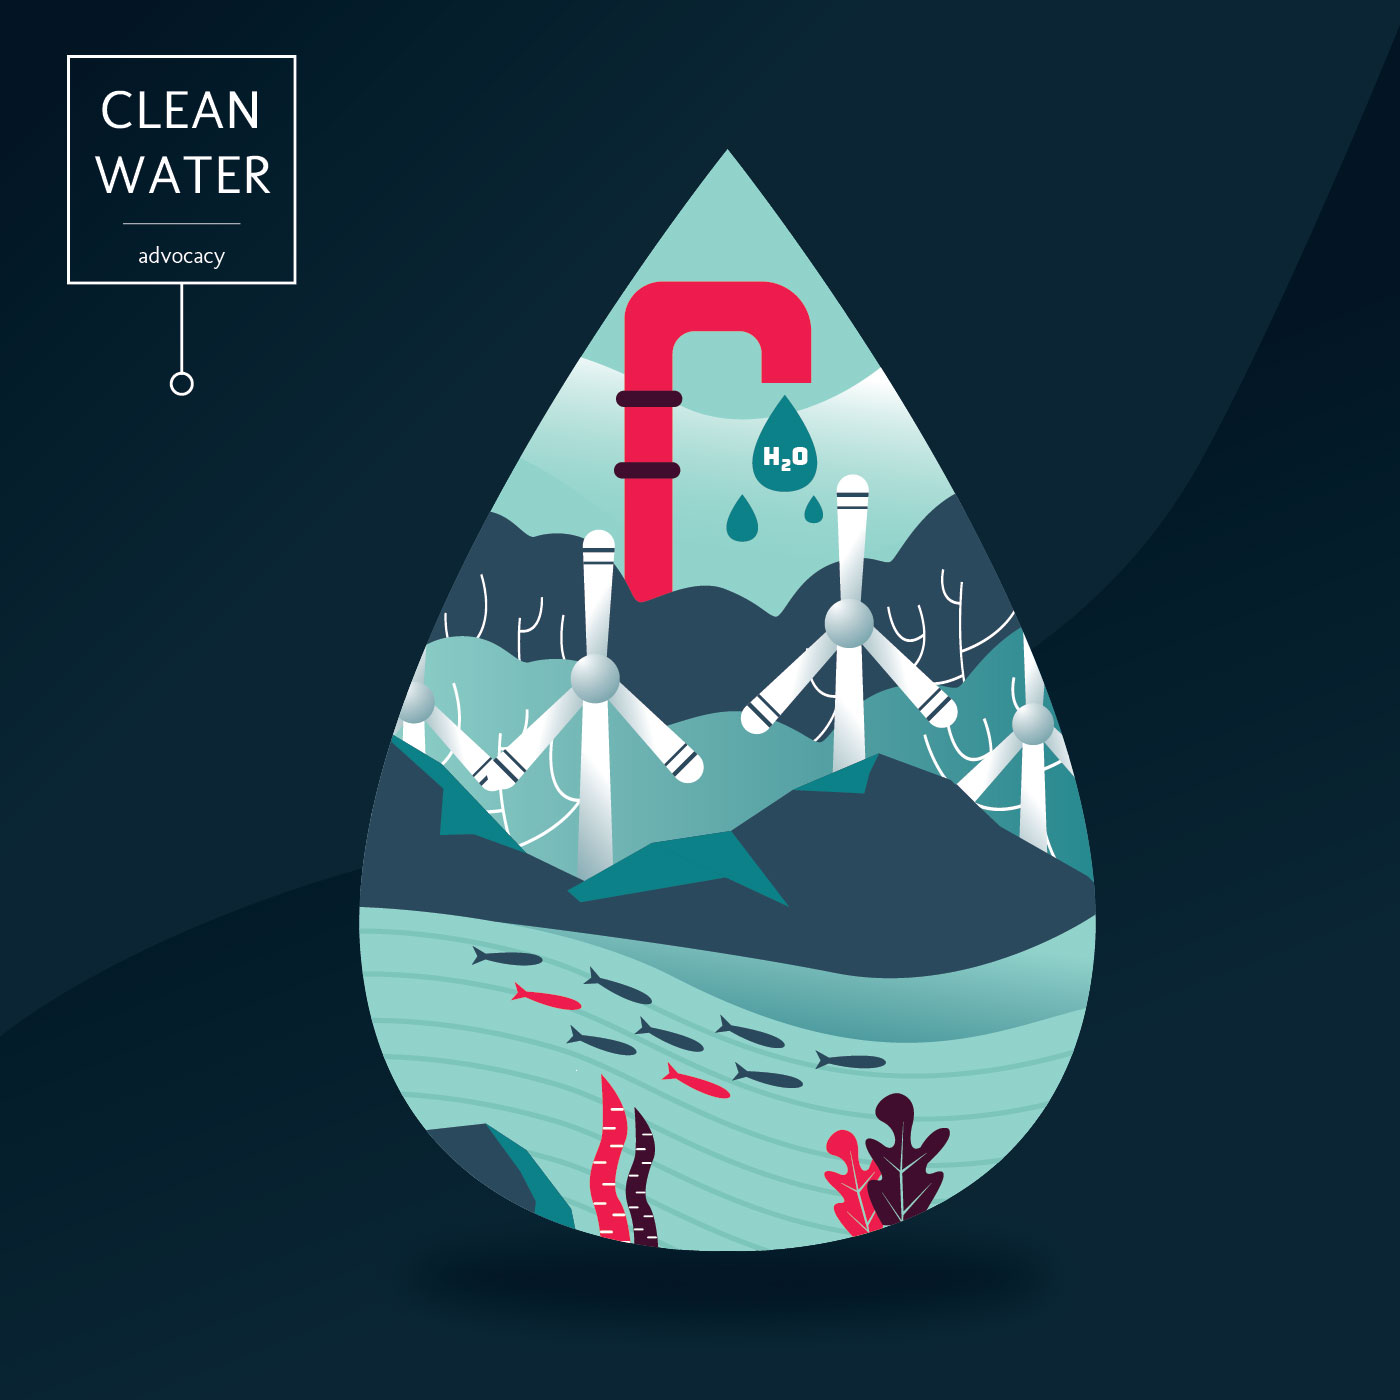 Green Mountain Power >> Clean Water Advocacy Vector Design - Download Free Vectors, Clipart Graphics & Vector Art